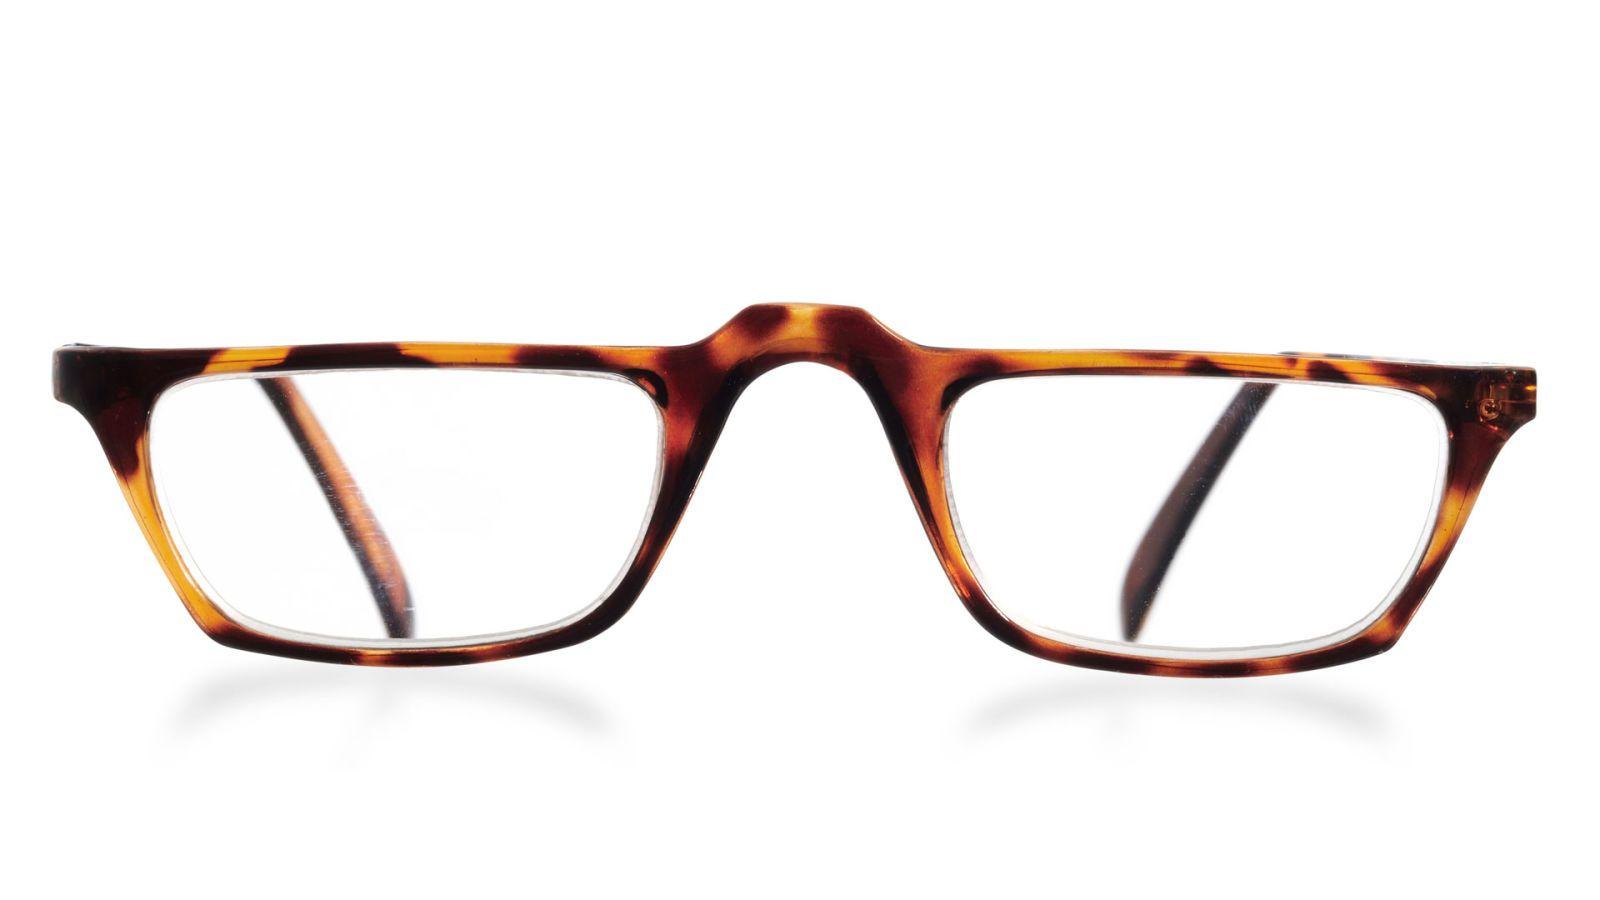 best online prescription glasses - Best Online Prescription Glasses